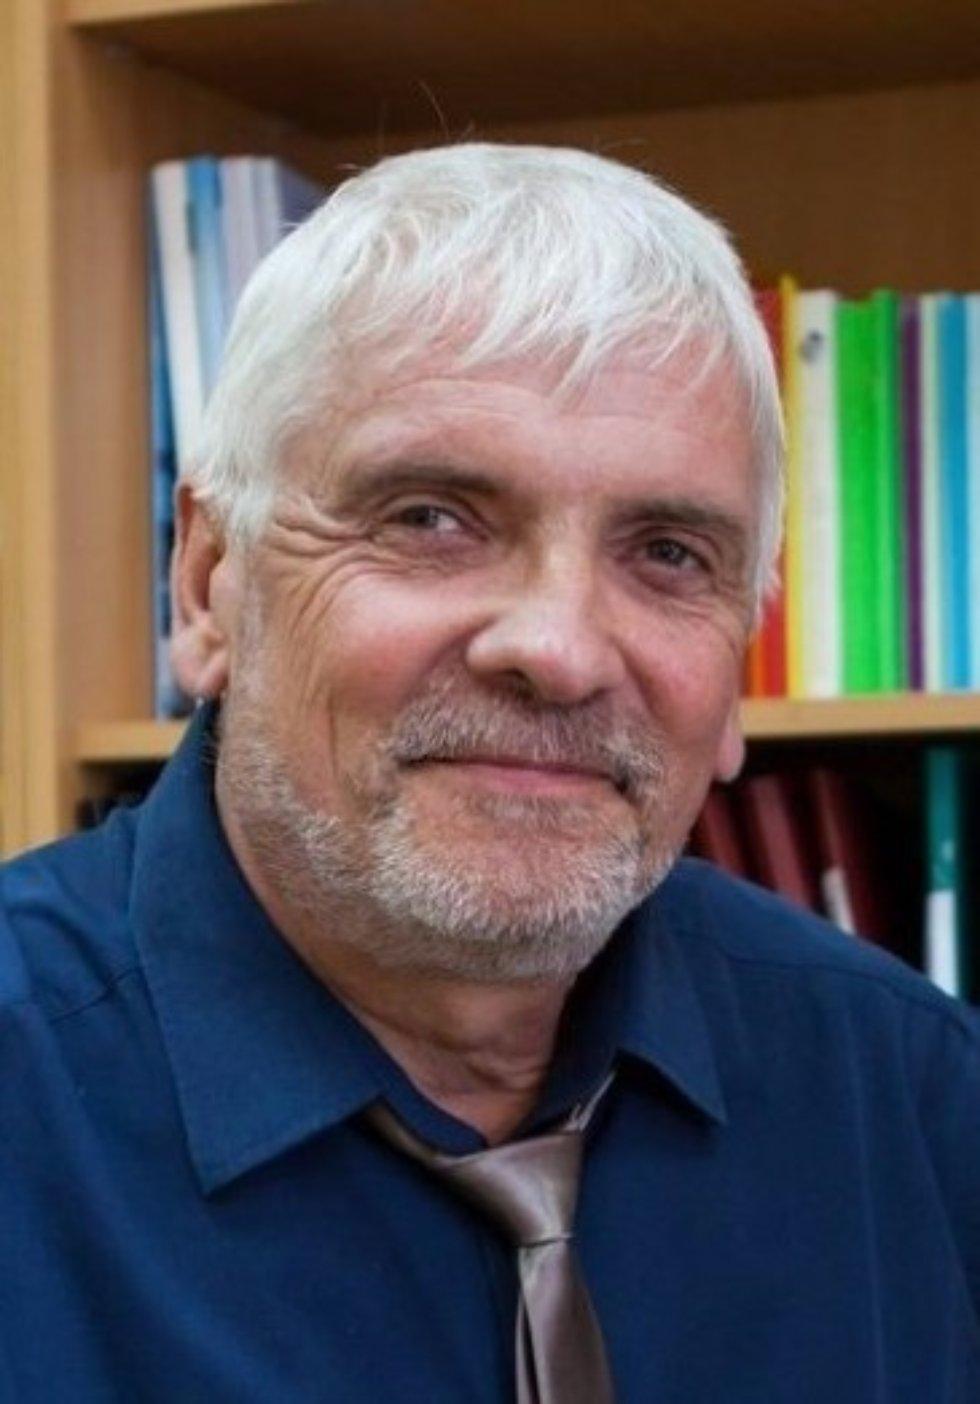 Виноградов Владислав Львович